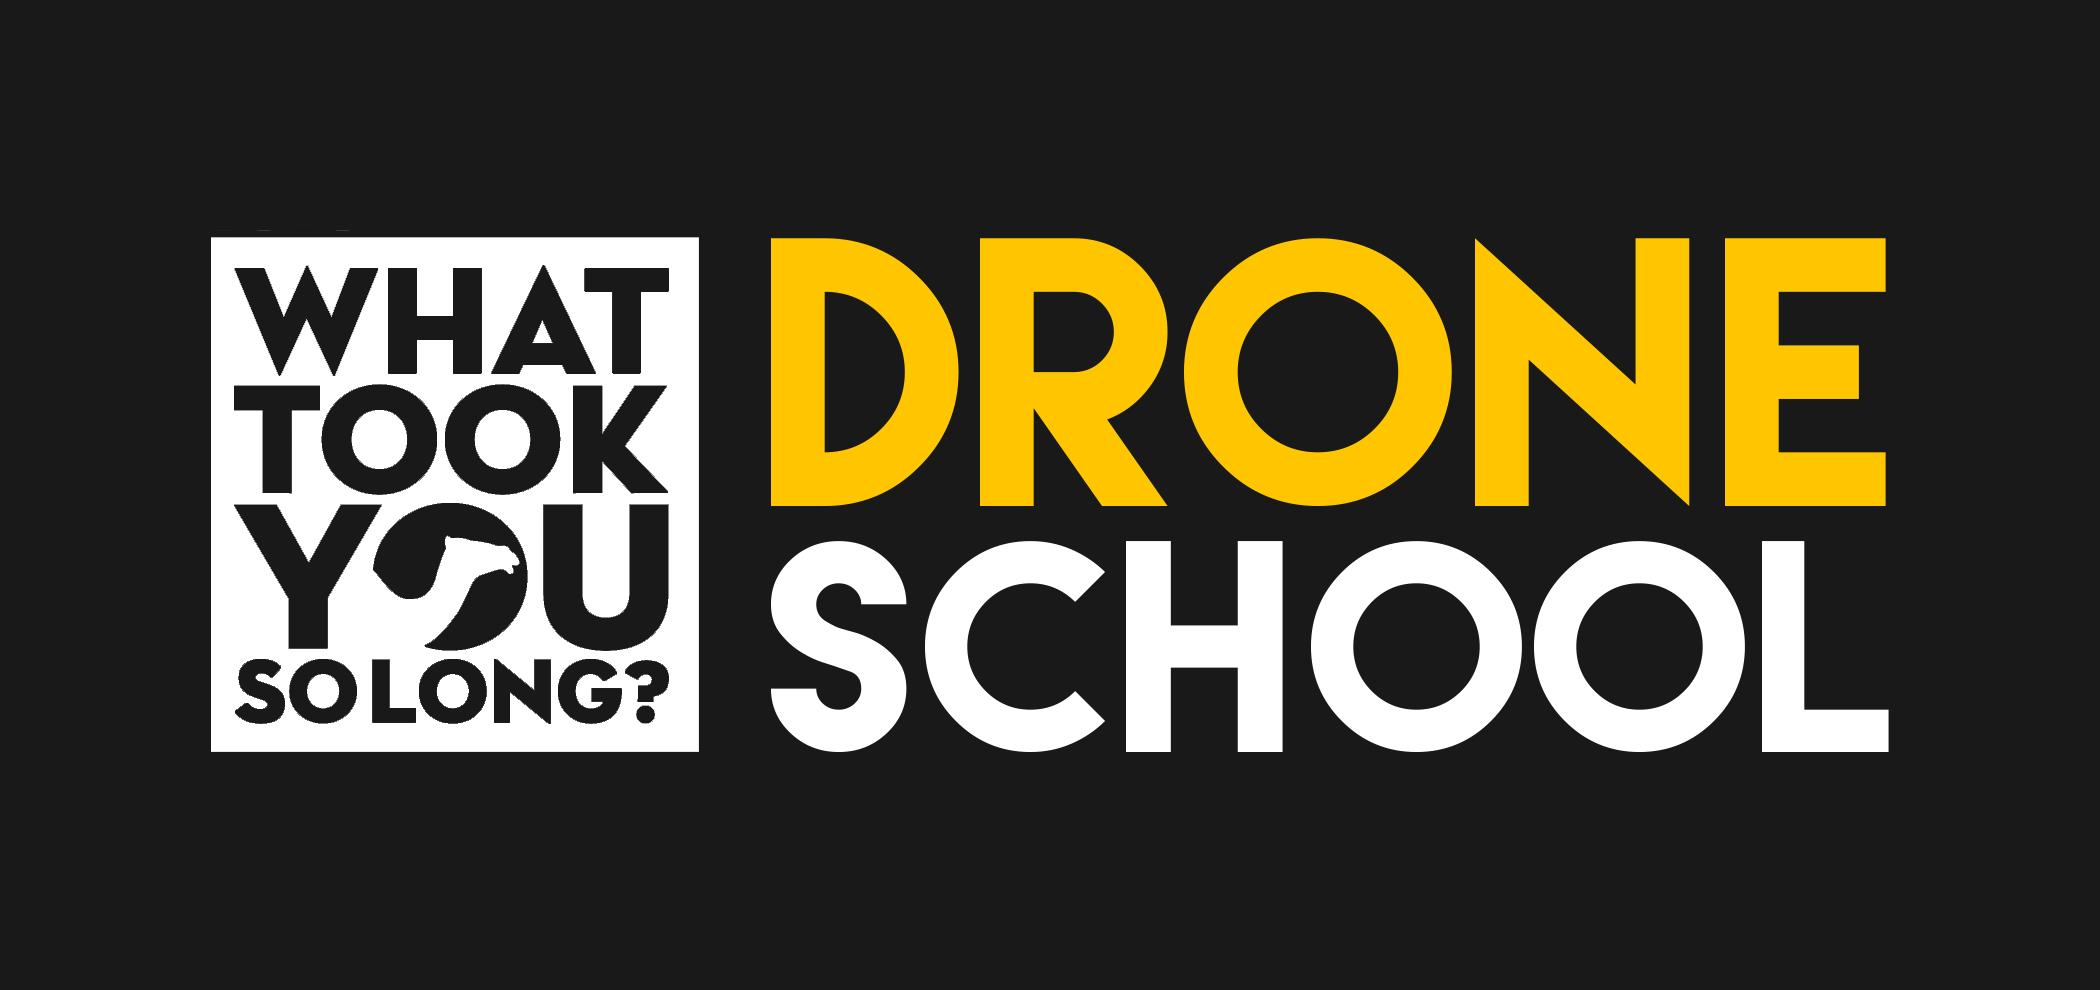 WTYSL_drone_logo2.jpg